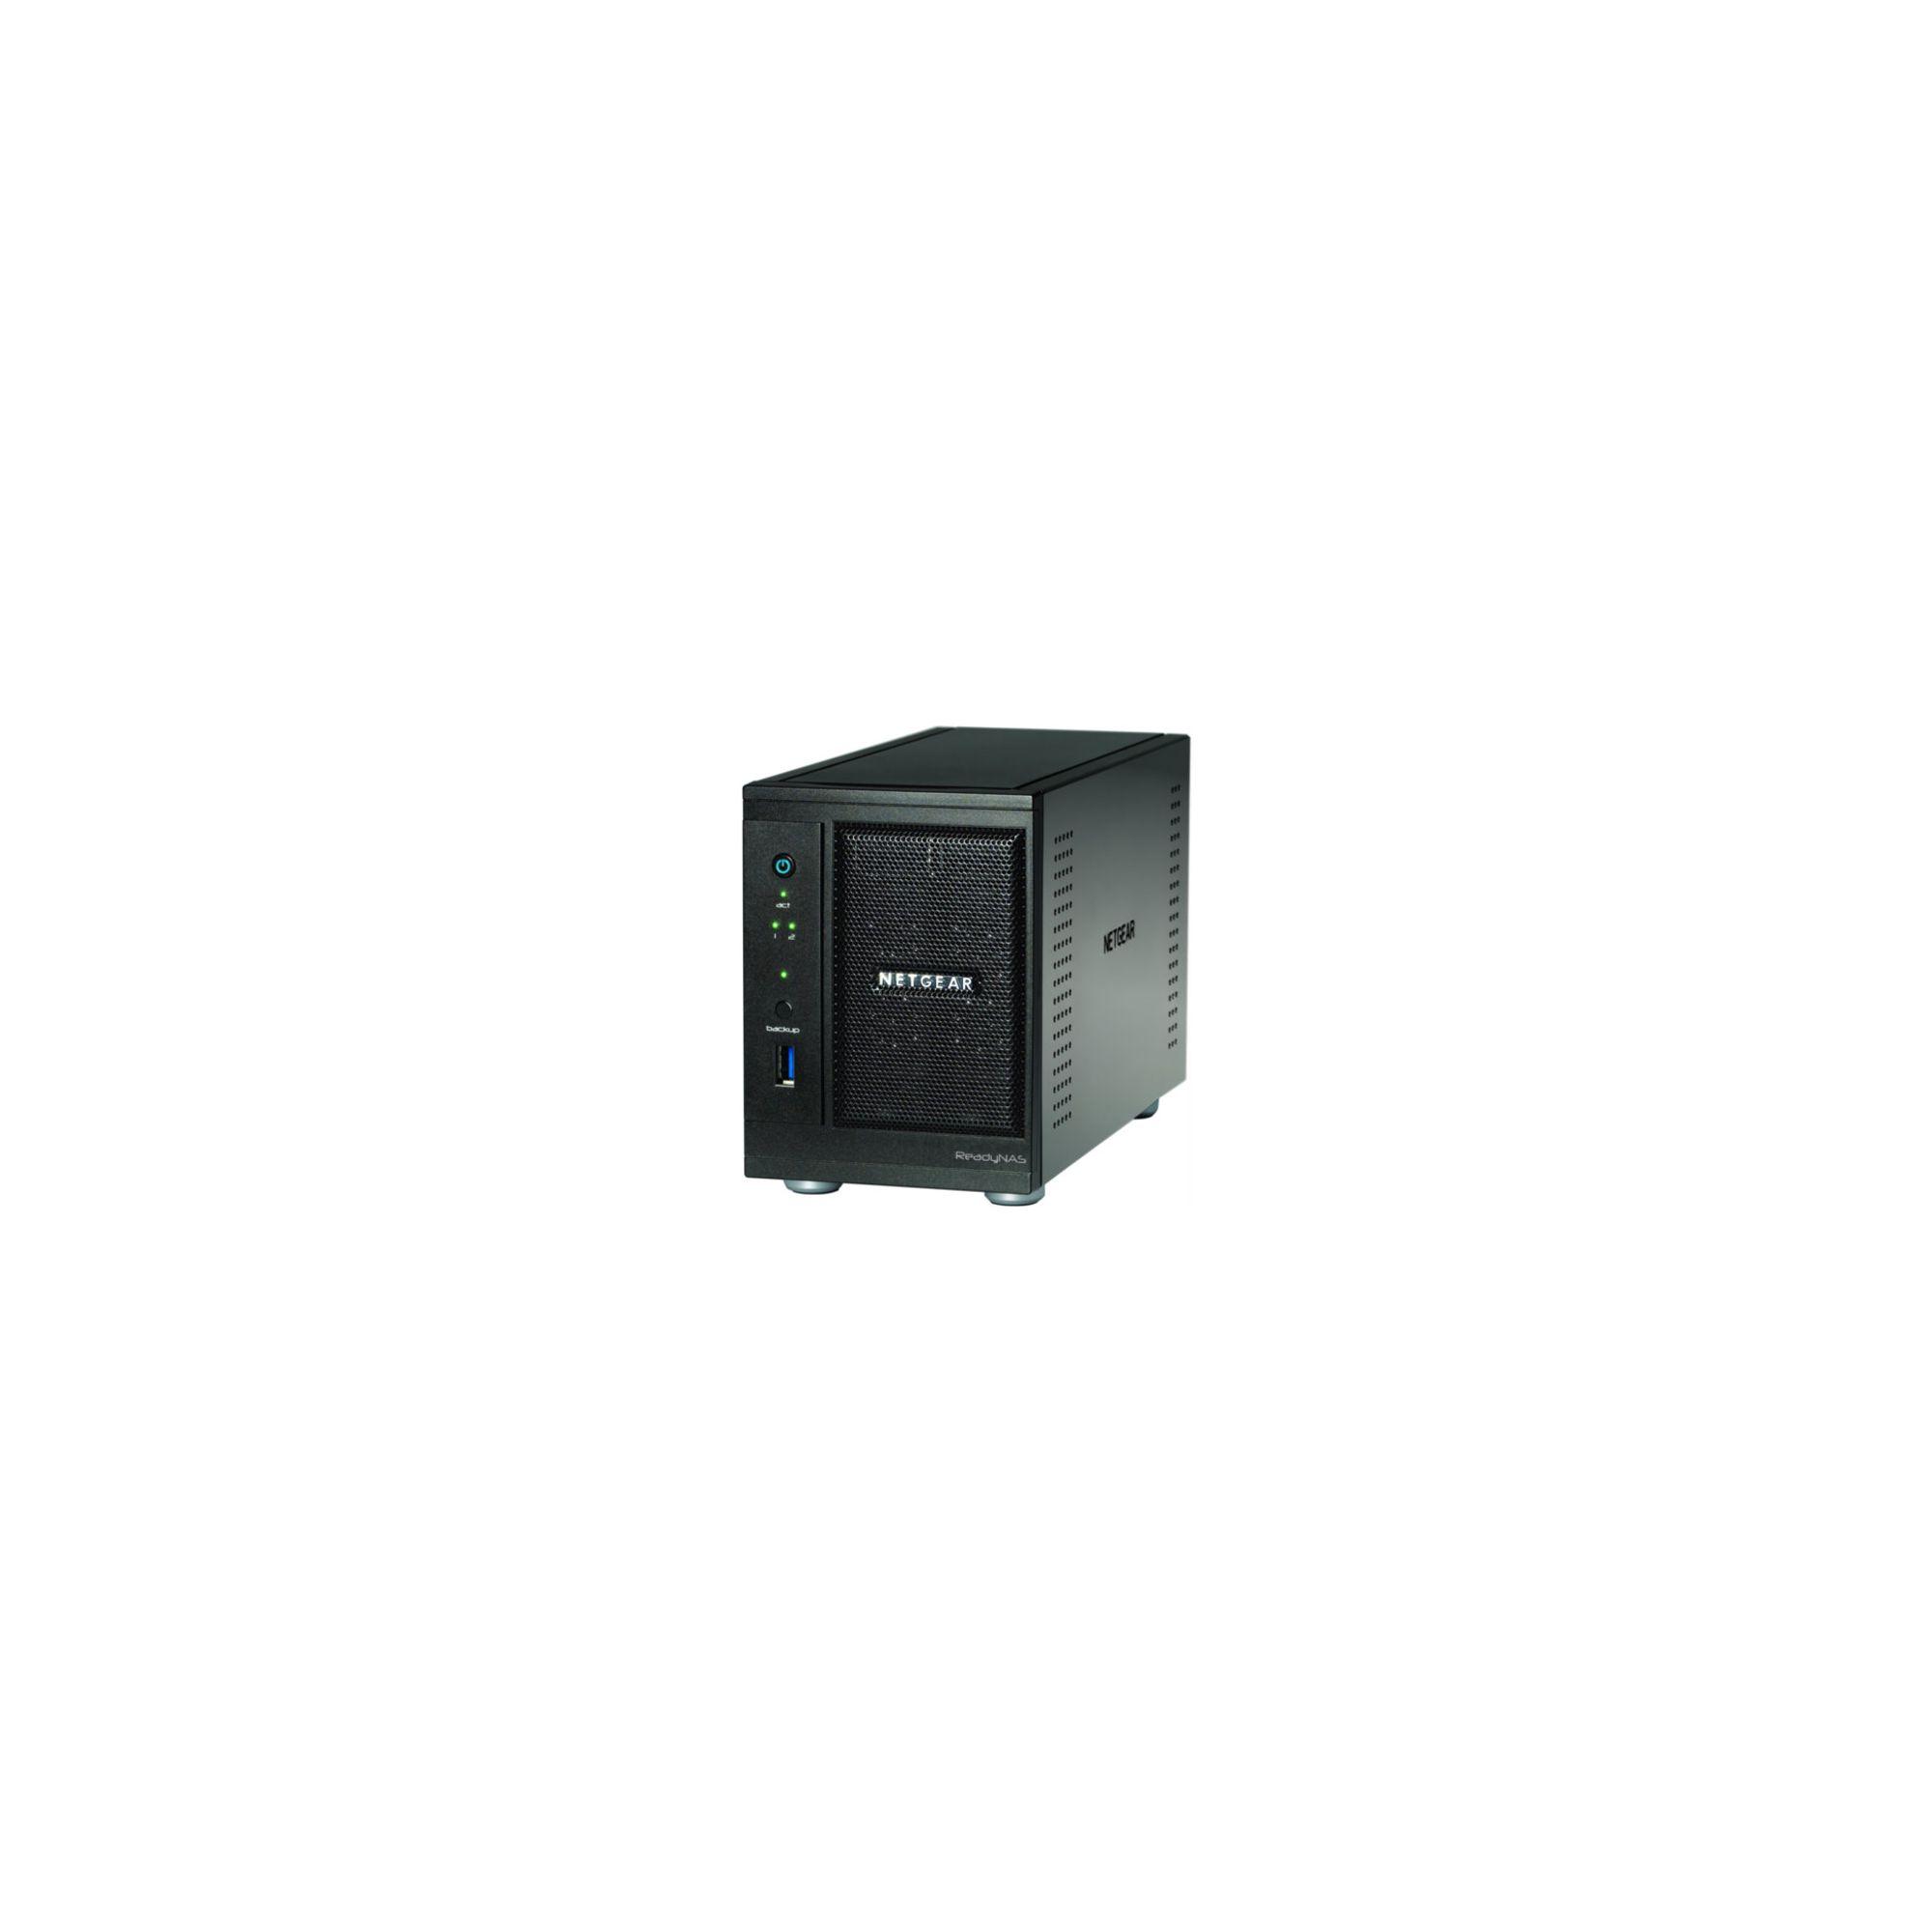 Netgear ReadyNAS Pro 2 2 X 2TB Internal Hard Drive at Tescos Direct